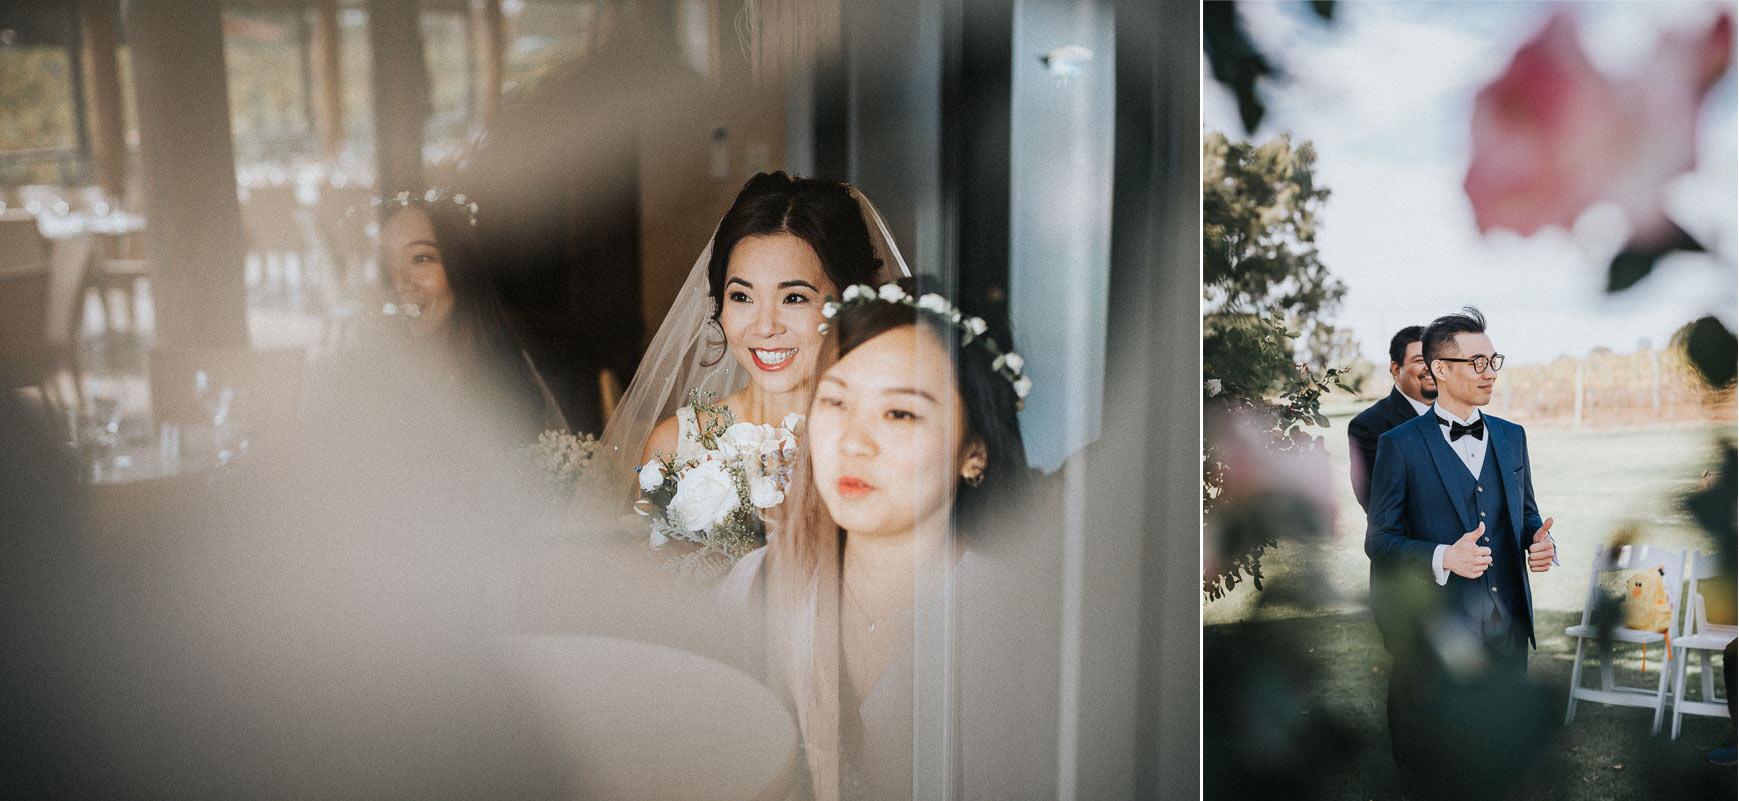 hong-kong-perth-wedding-photographer-8.jpg